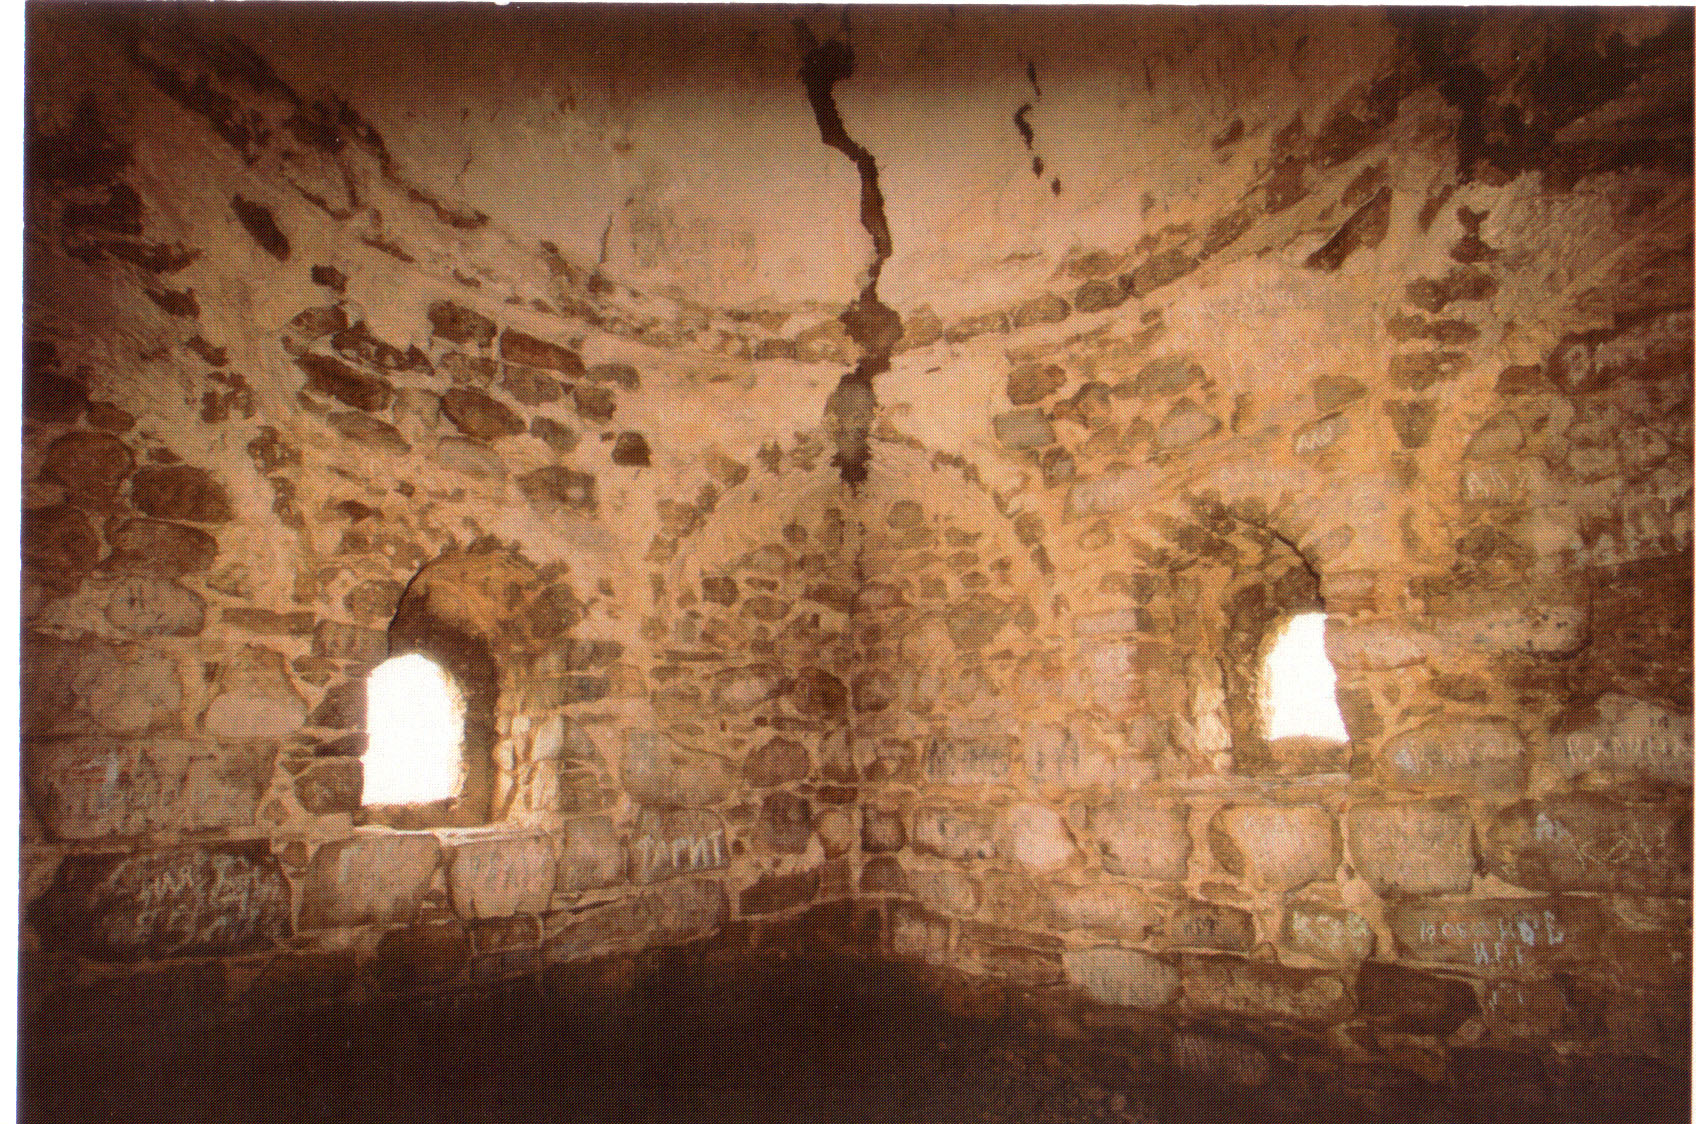 Рис. 3. Мавзолей Тура-хана изнутри